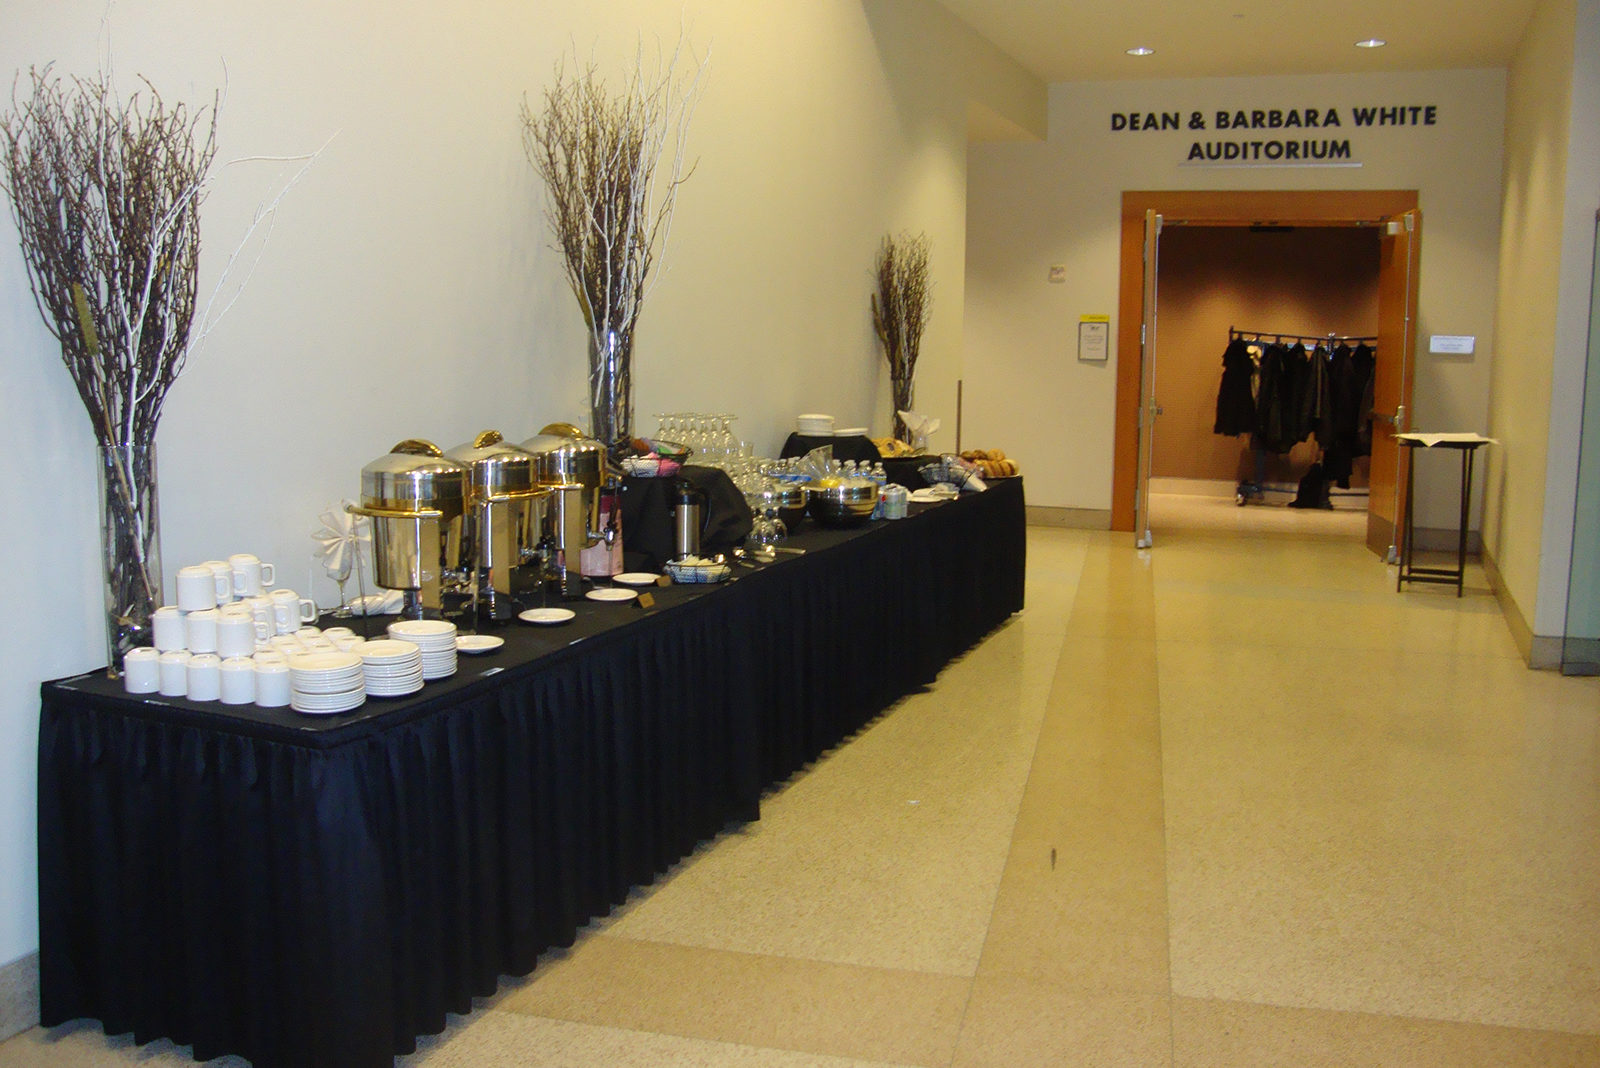 Dean and Barbara White Auditorium Enterance